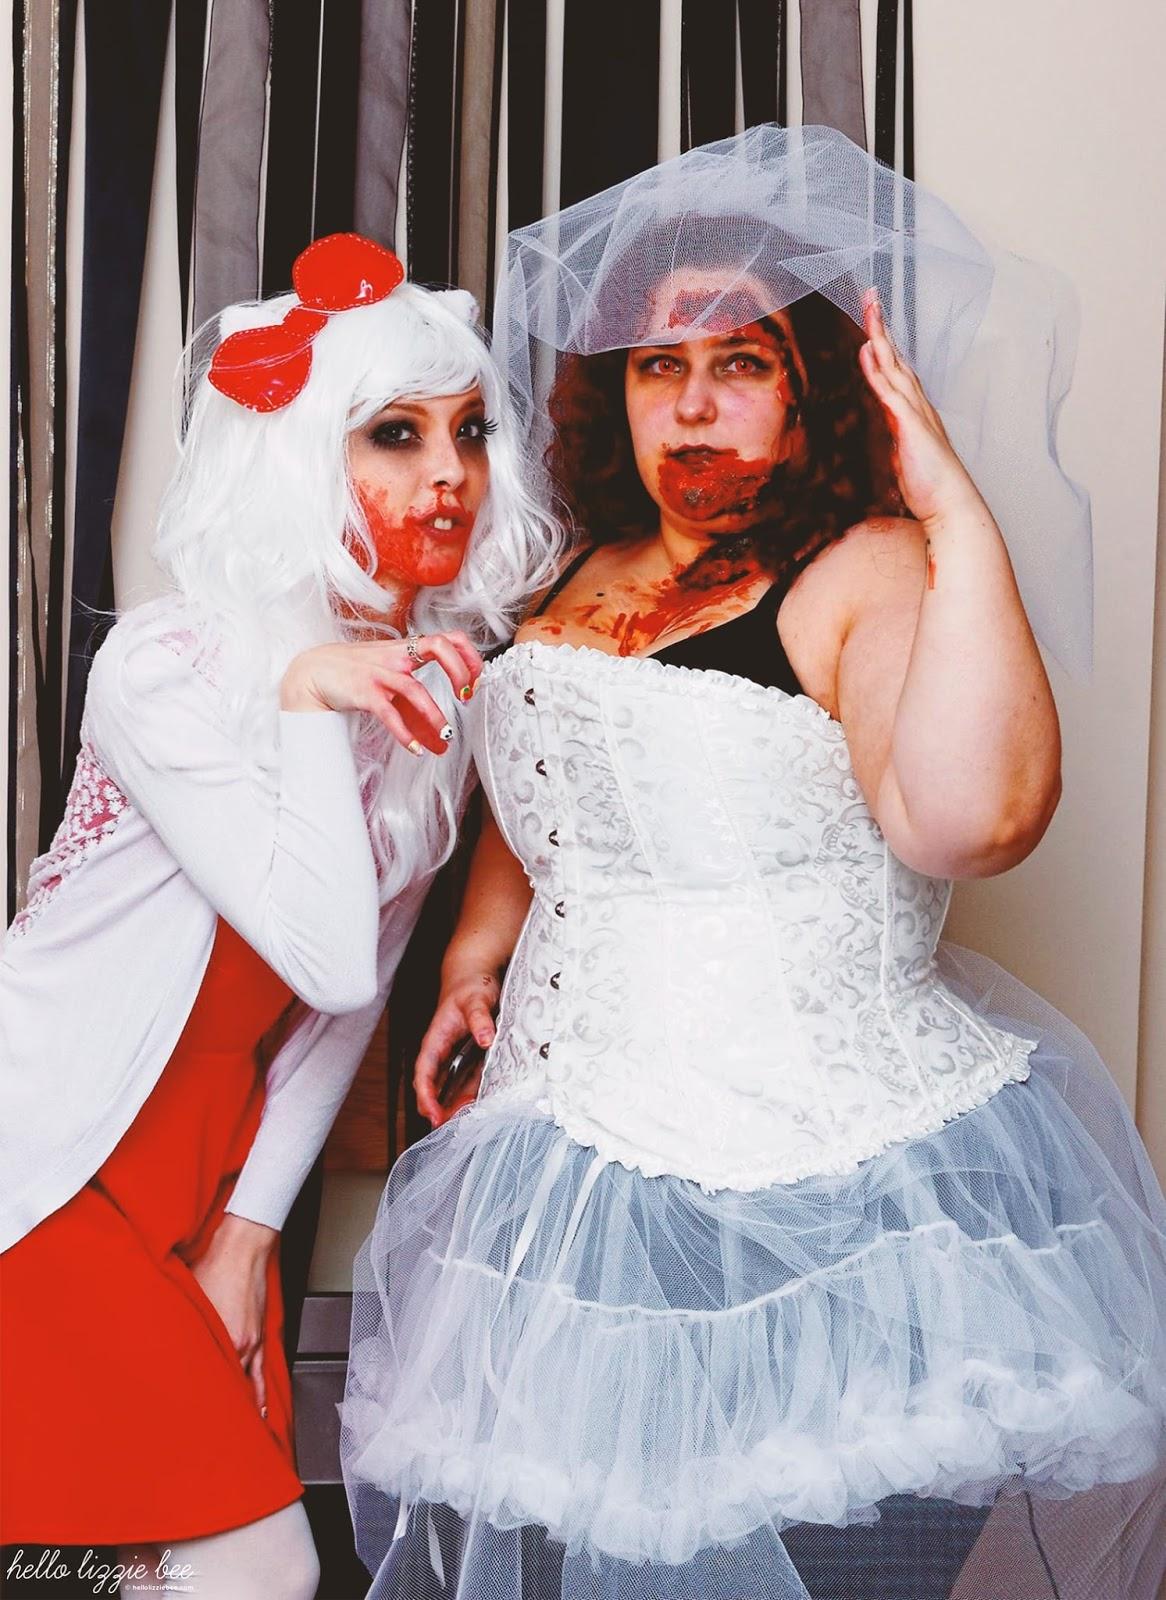 zombie hello kitty, zombie bride